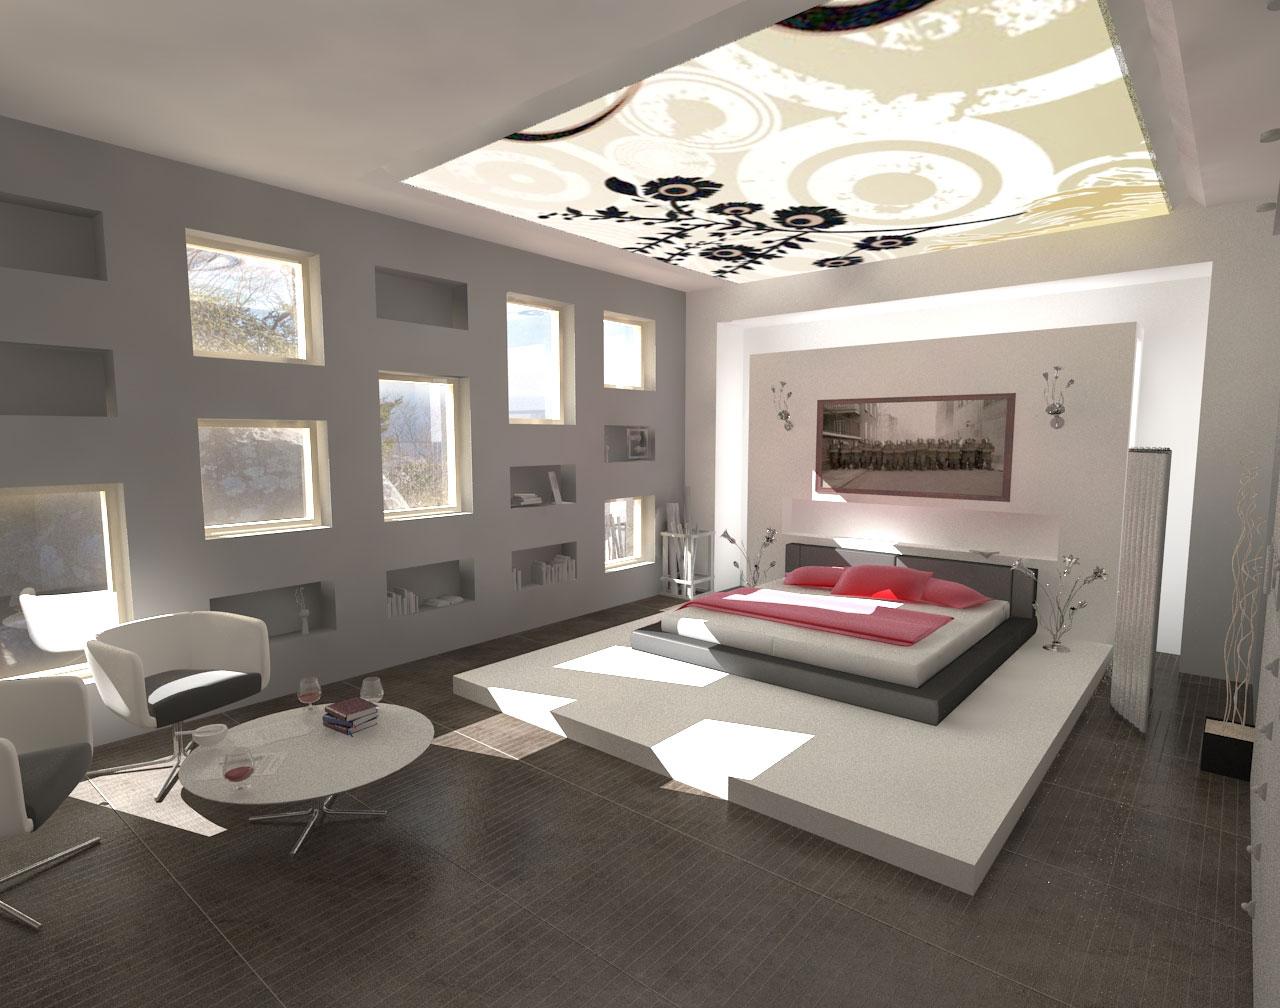 cool bedroom paint colors ideas